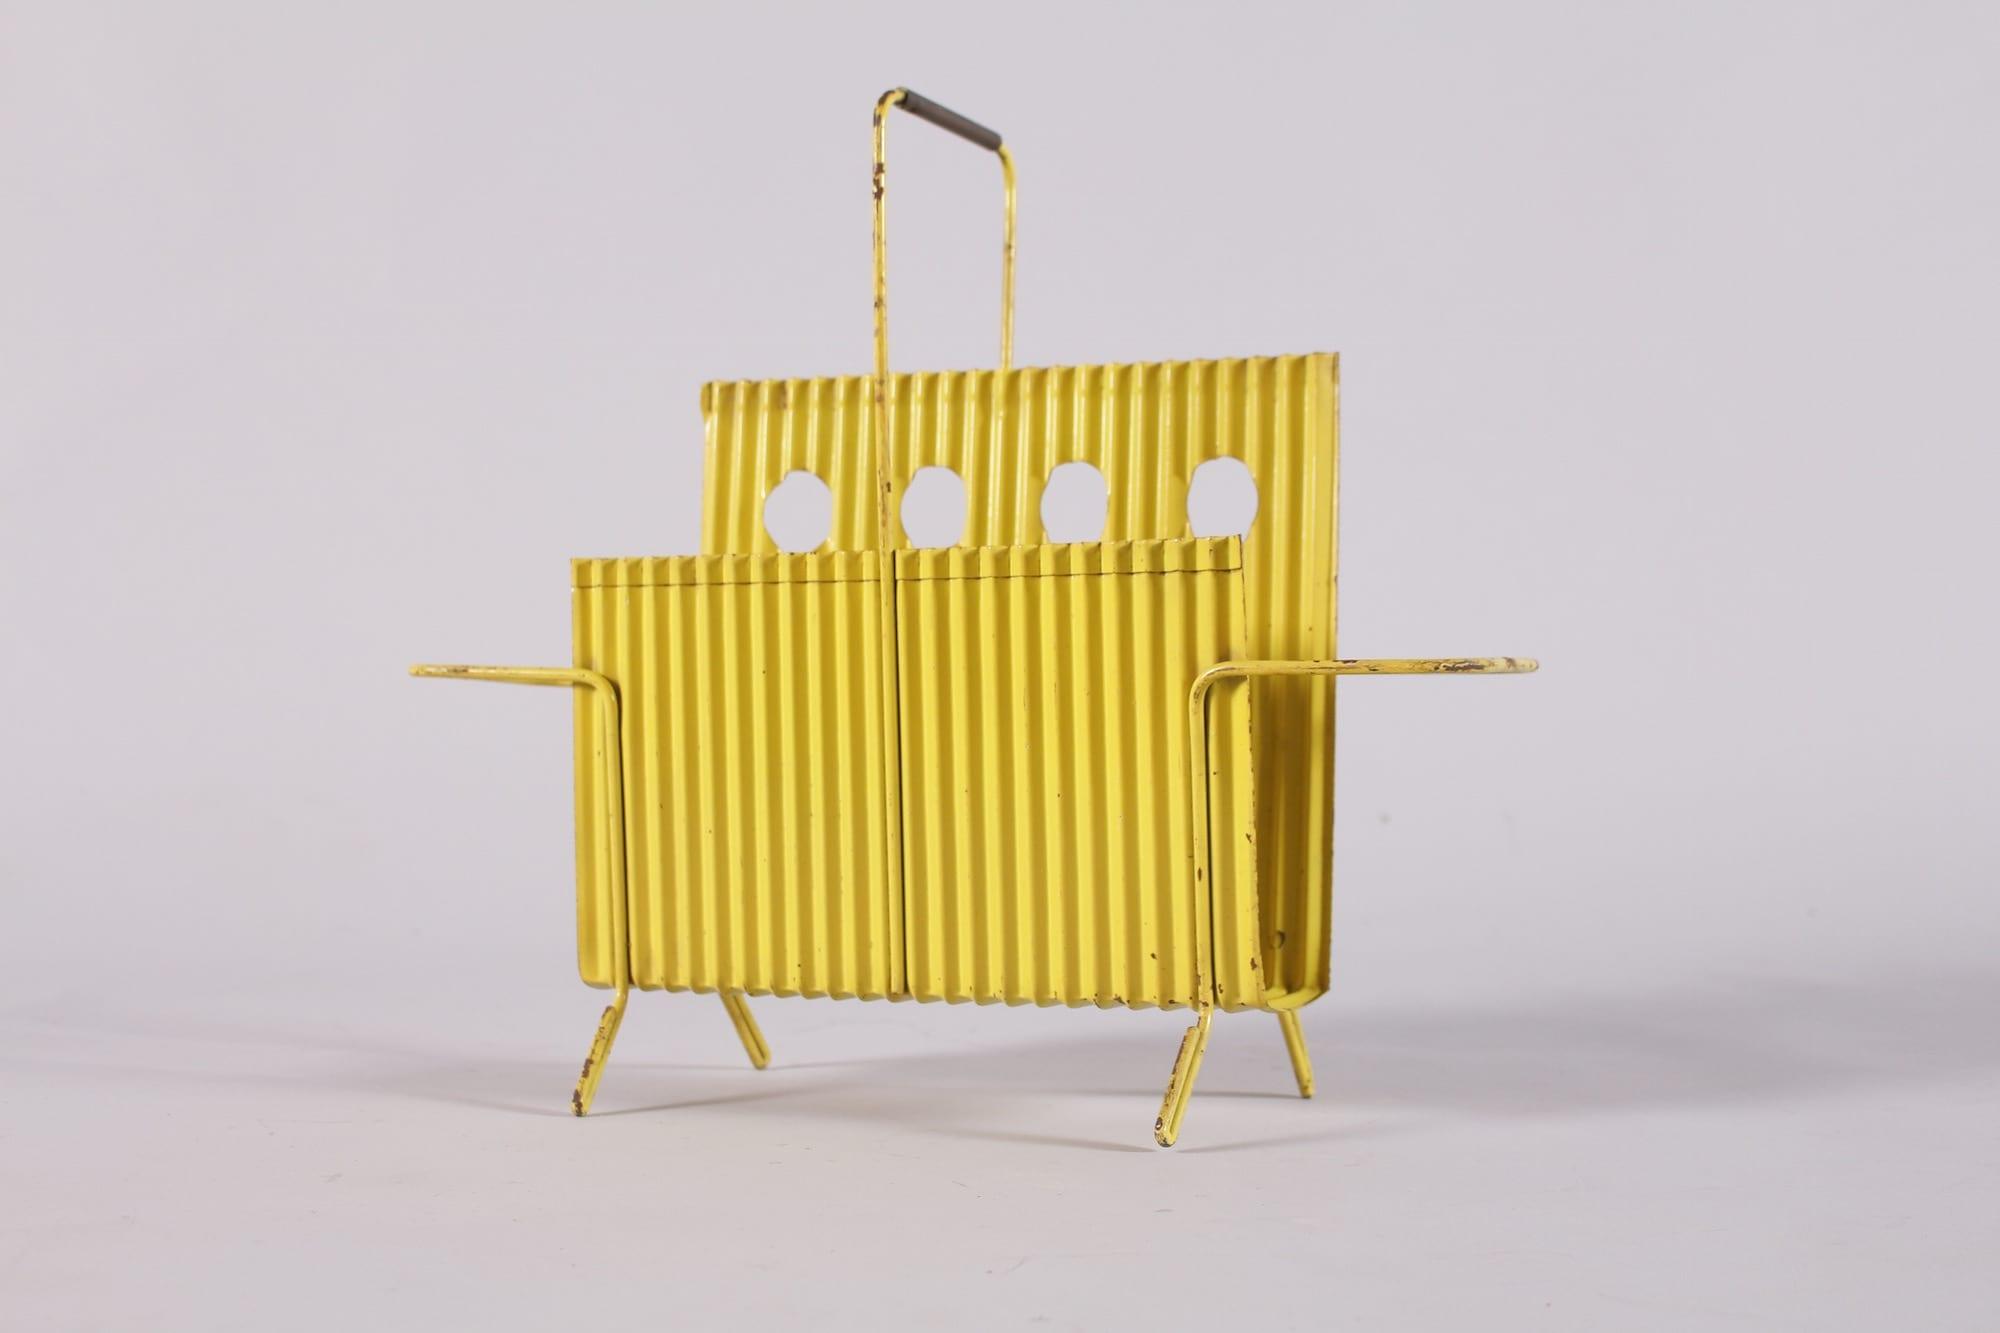 porte revue java mathieu mat got meubles vintage li ge. Black Bedroom Furniture Sets. Home Design Ideas